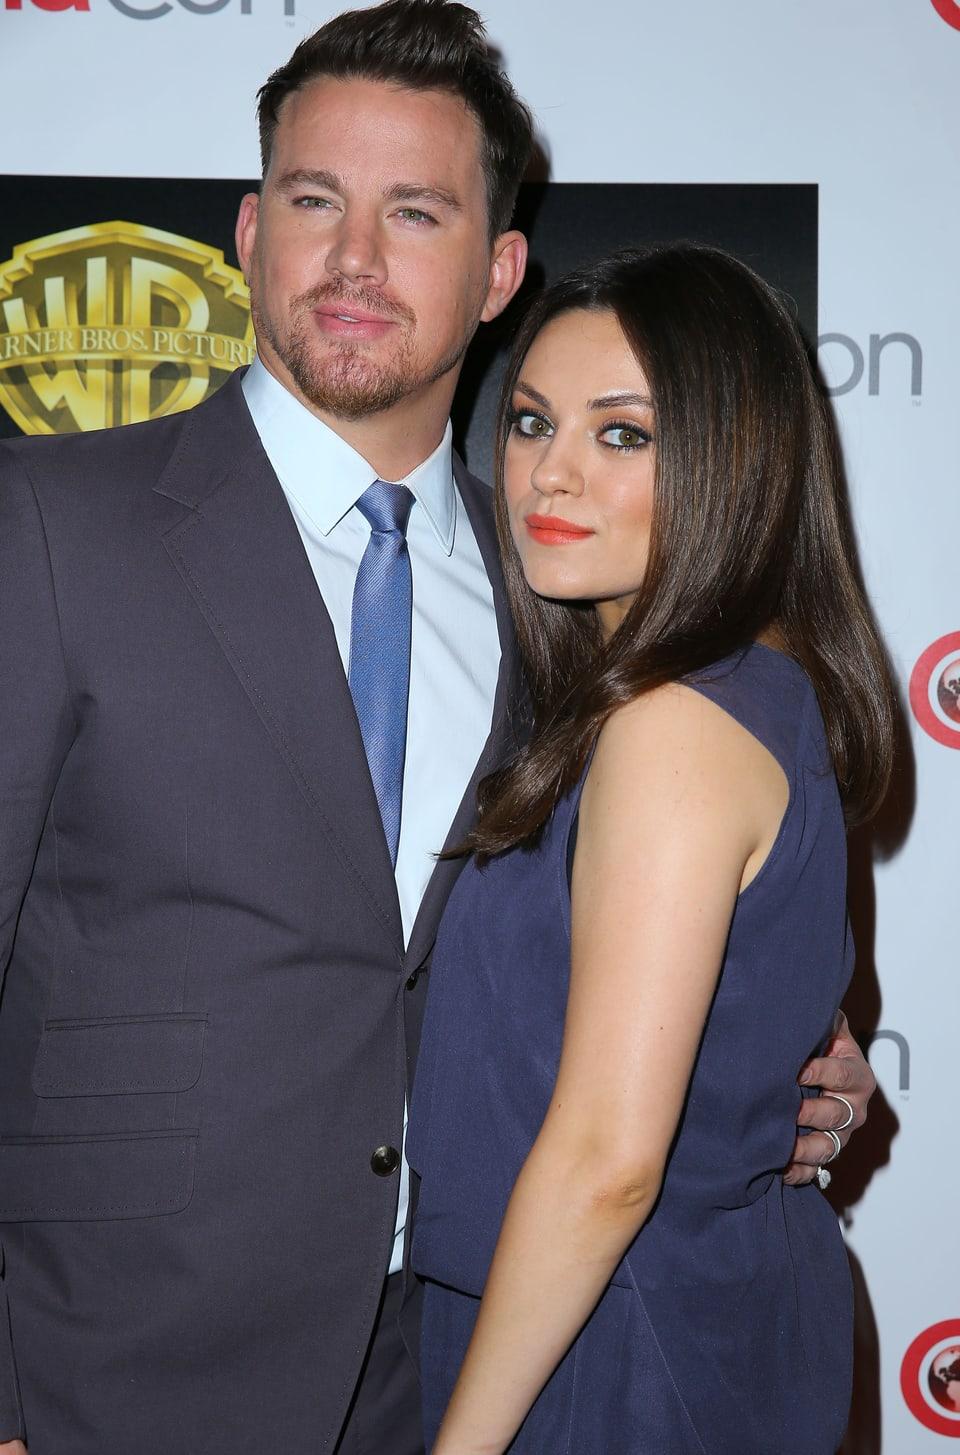 Mila Kunis mit Channing Tatum